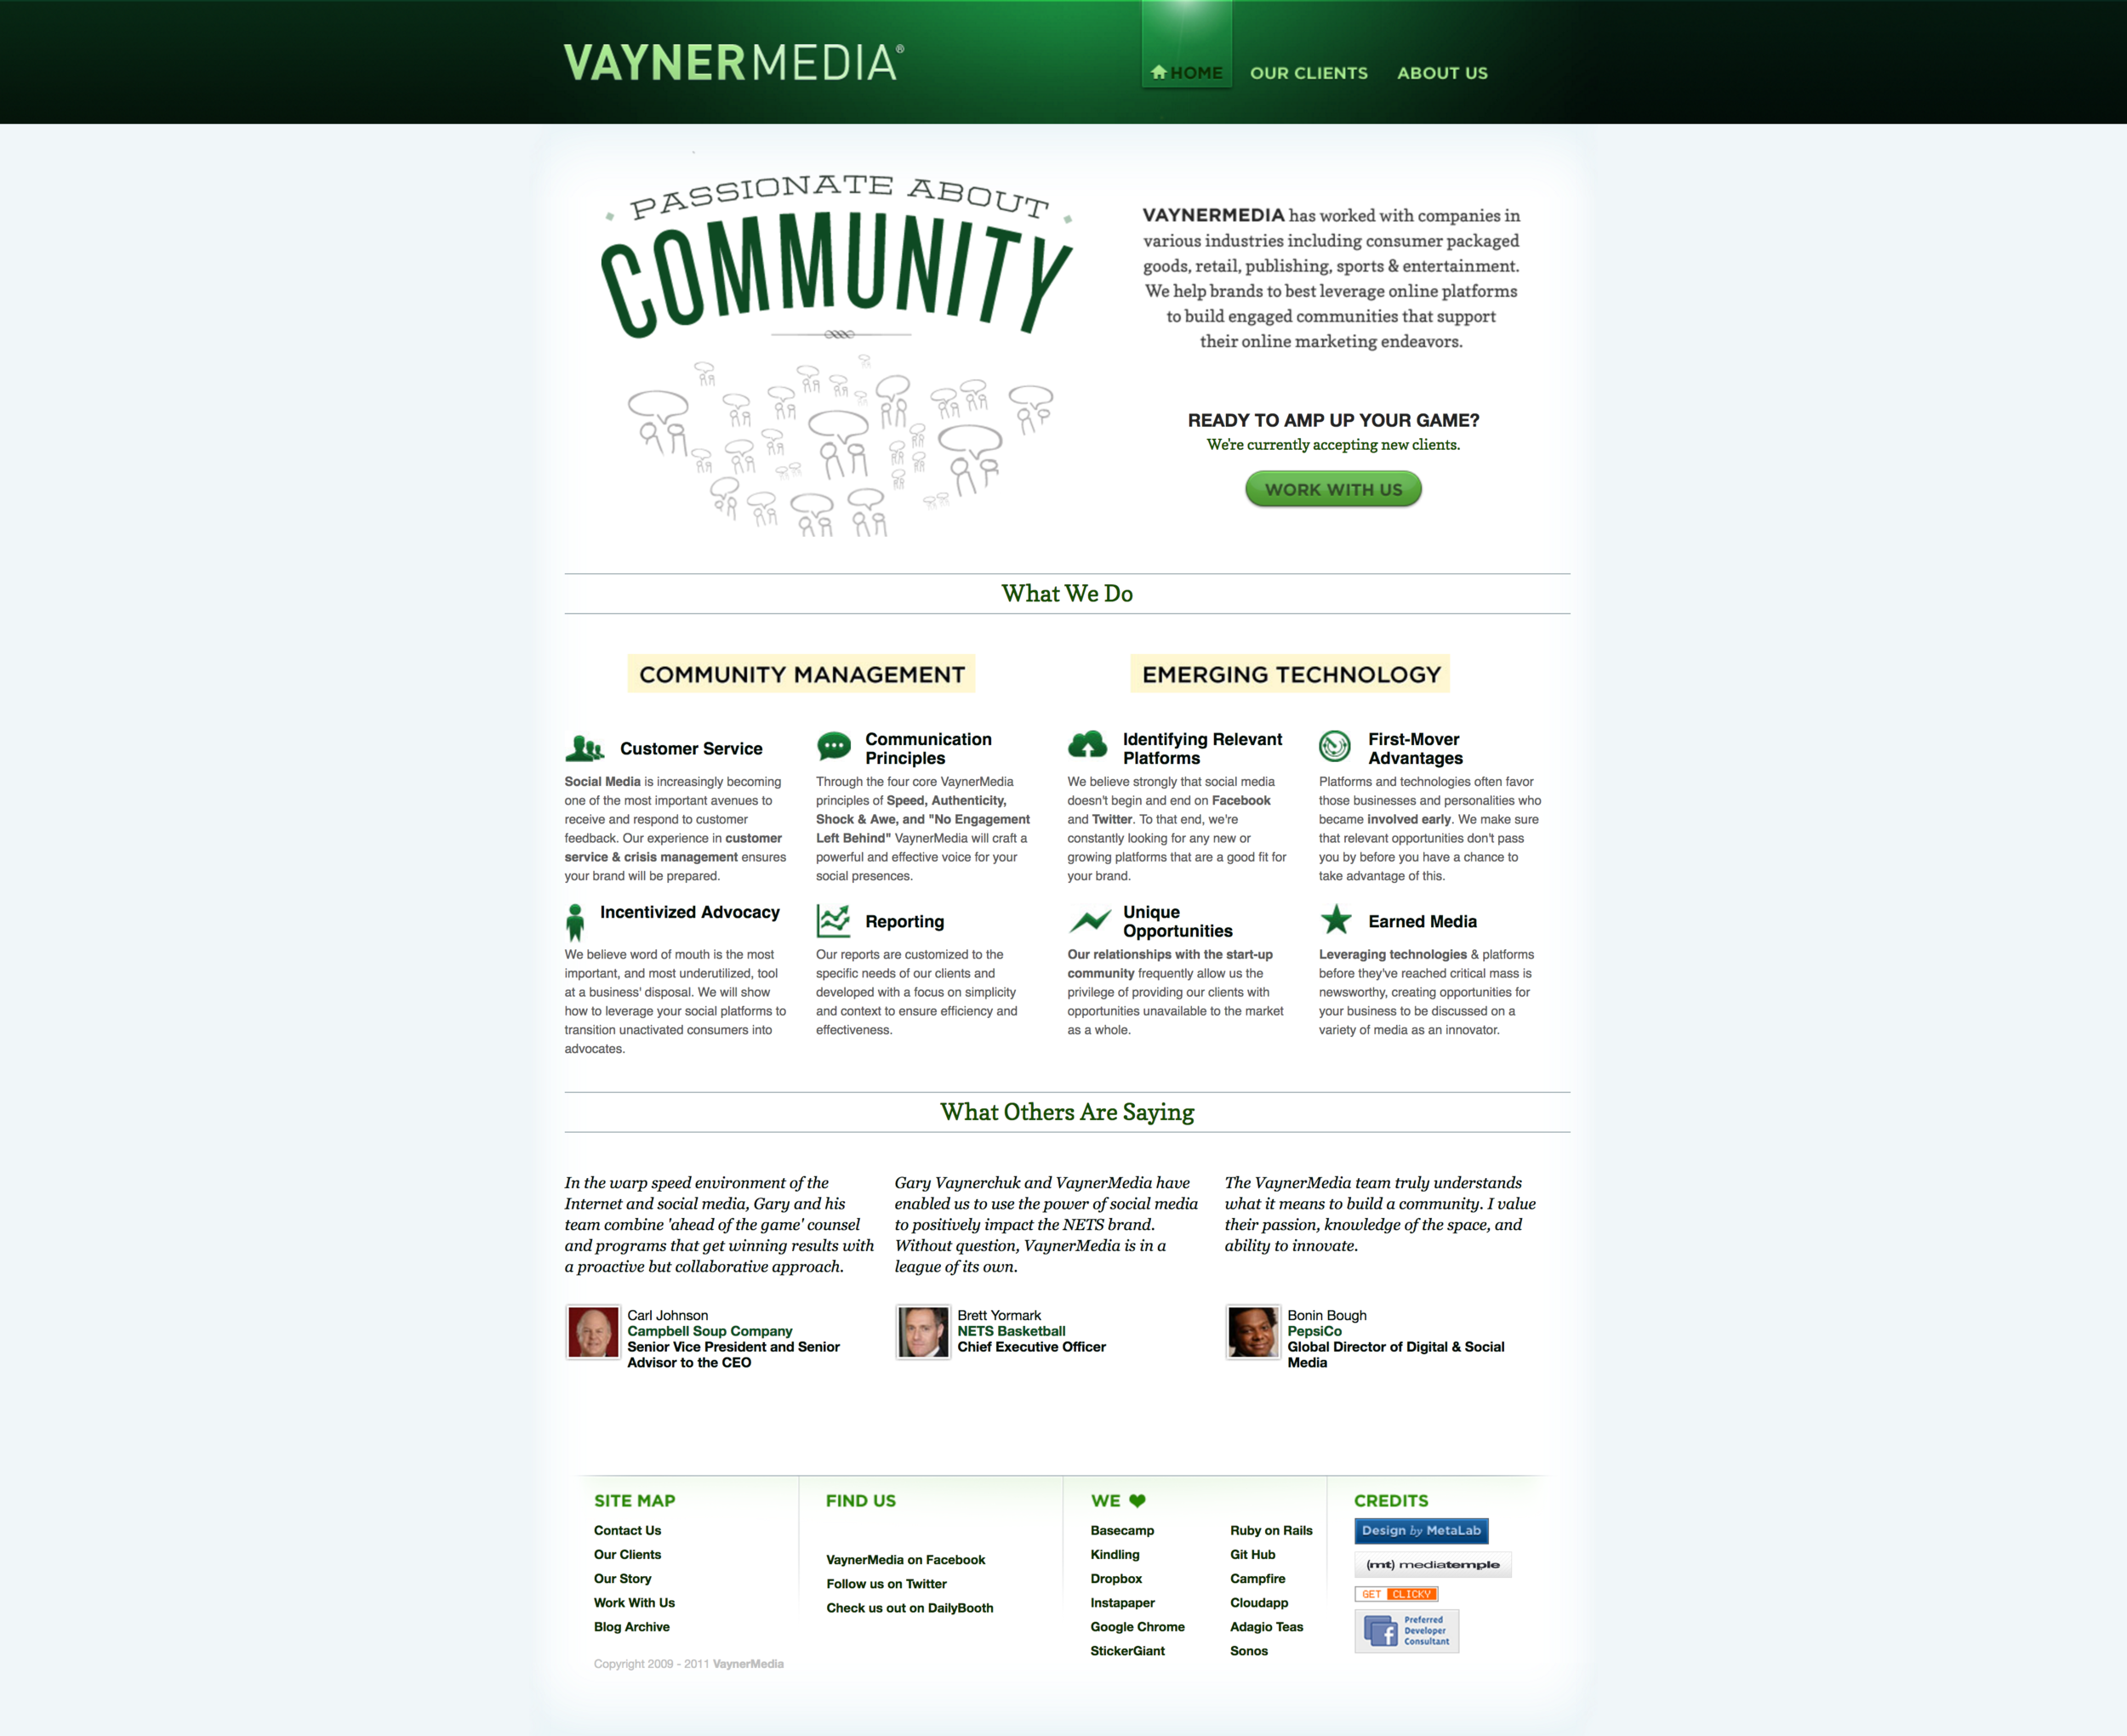 screencapture-web-archive-org-web-20110512101152-http-vaynermedia-com-1501799536693.png